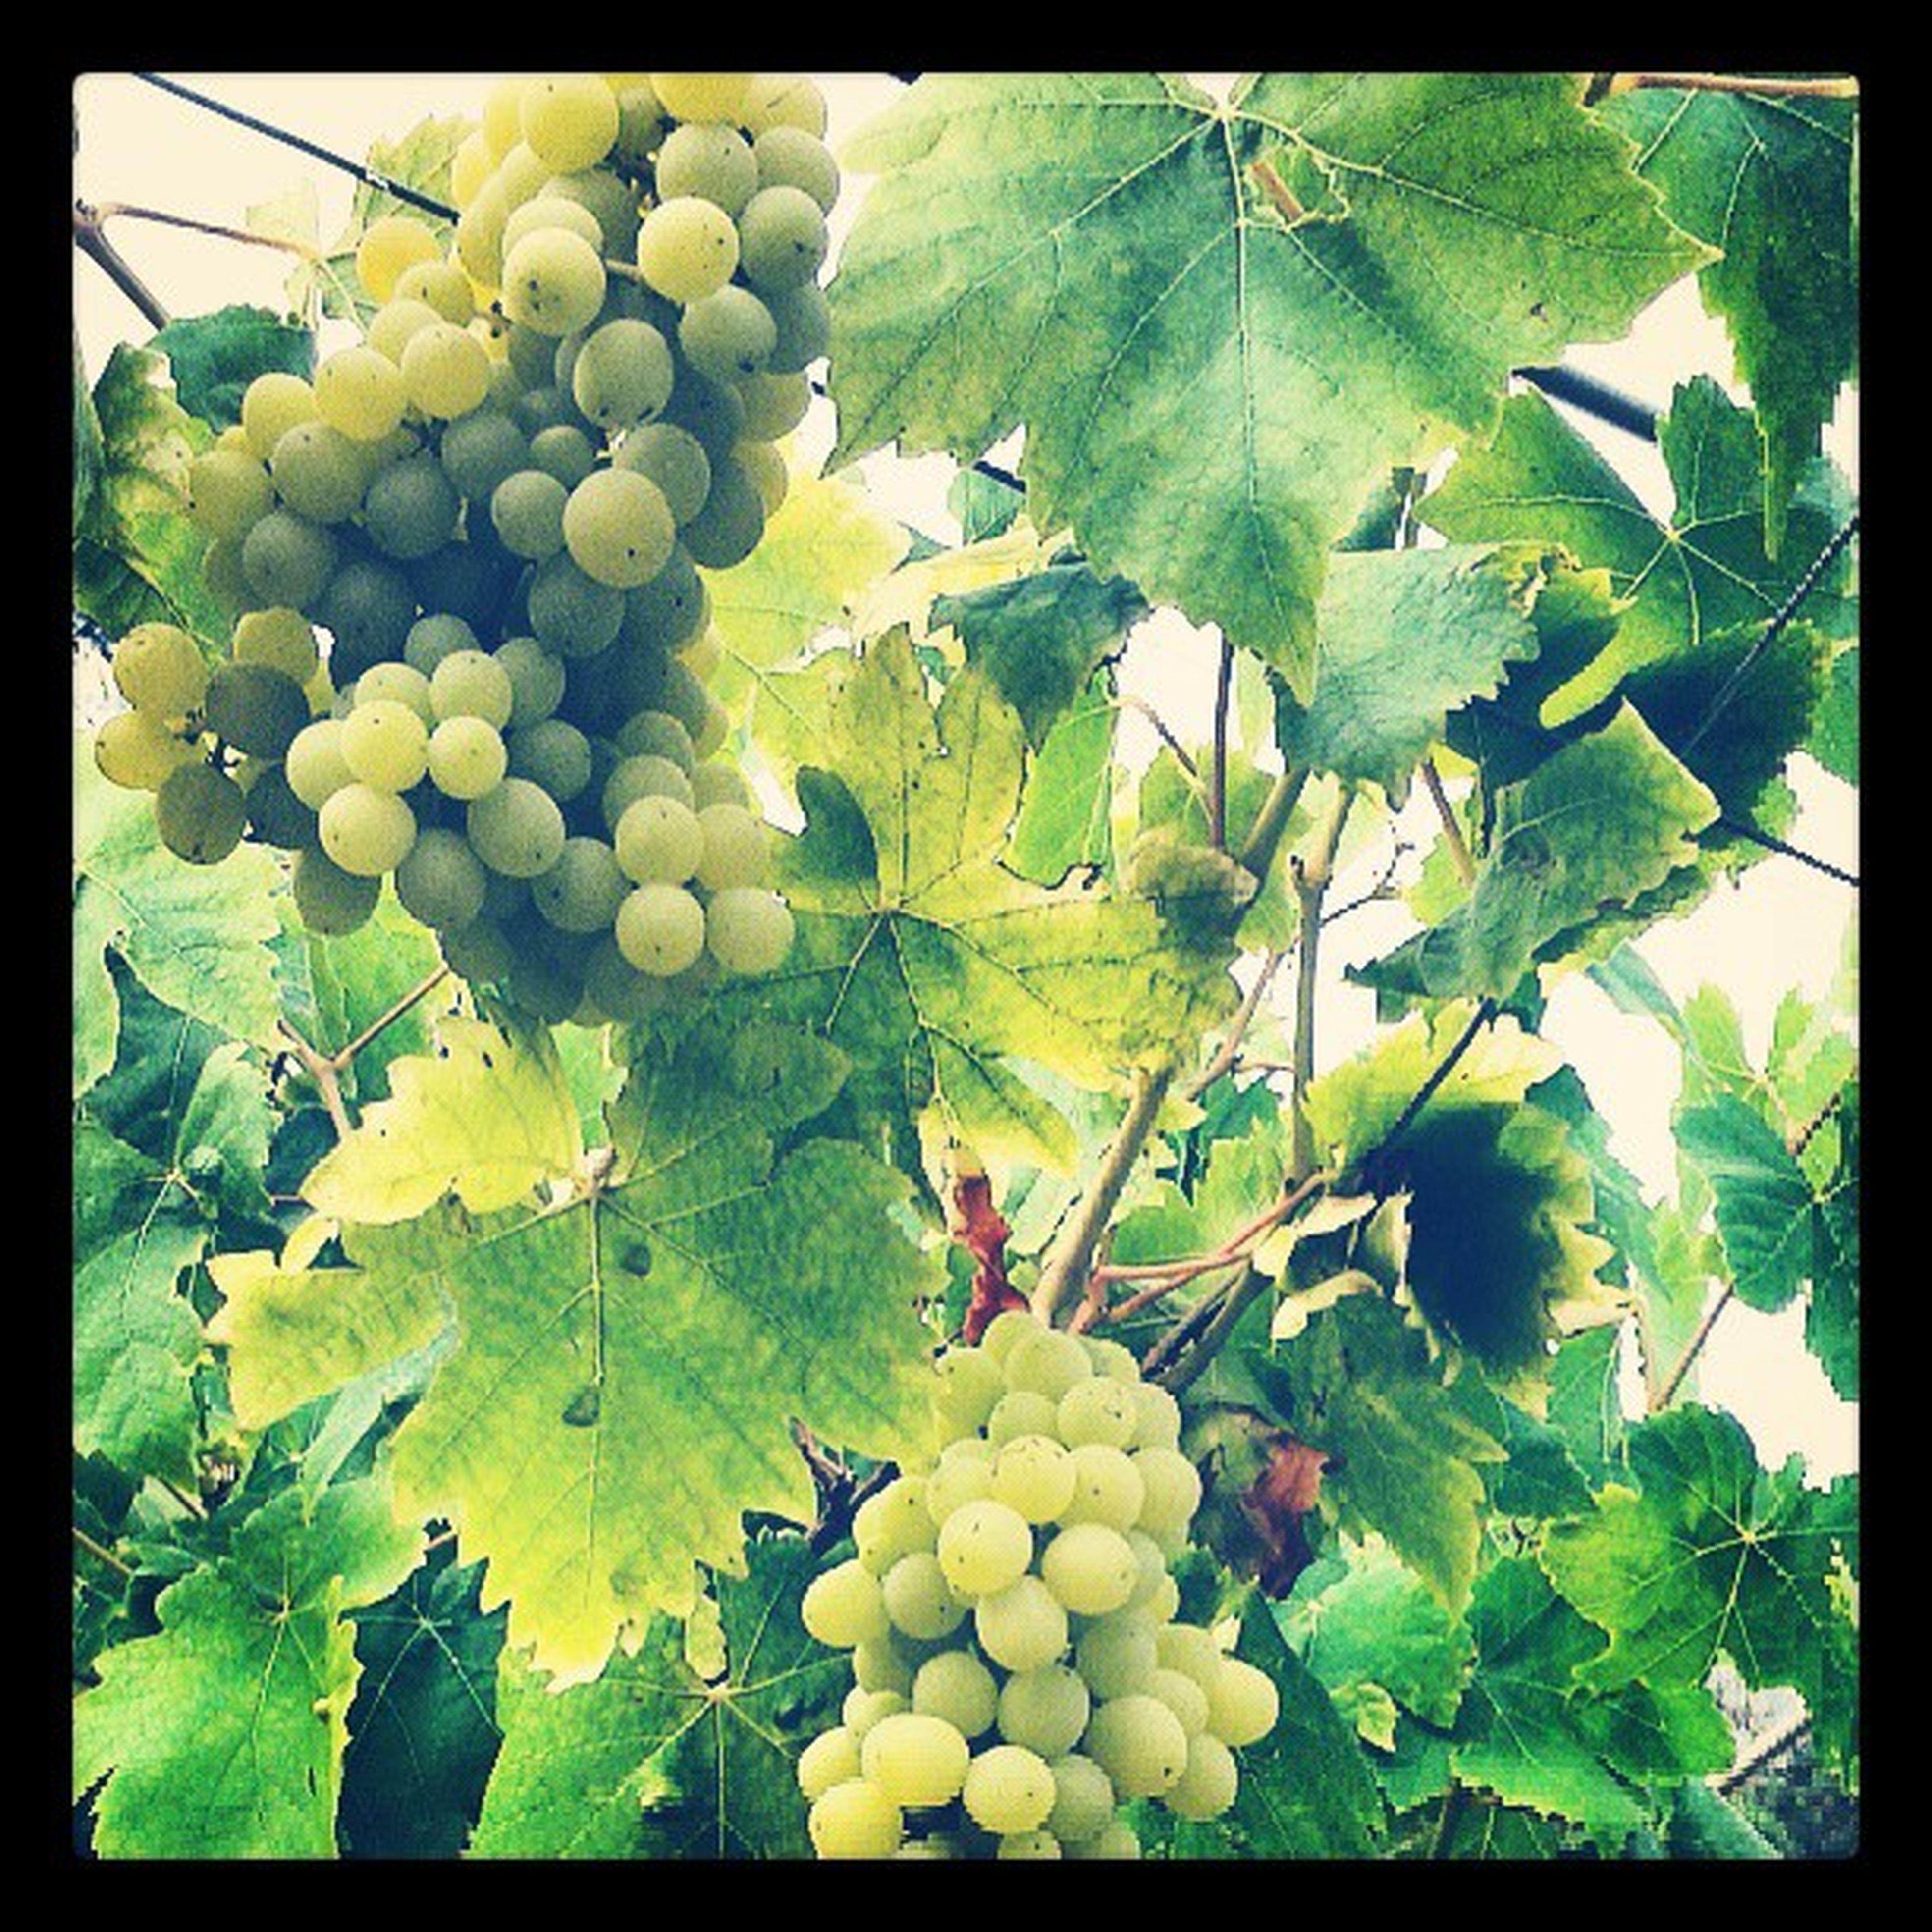 Grapes Deirelkamar Jnayne Beautiful yum